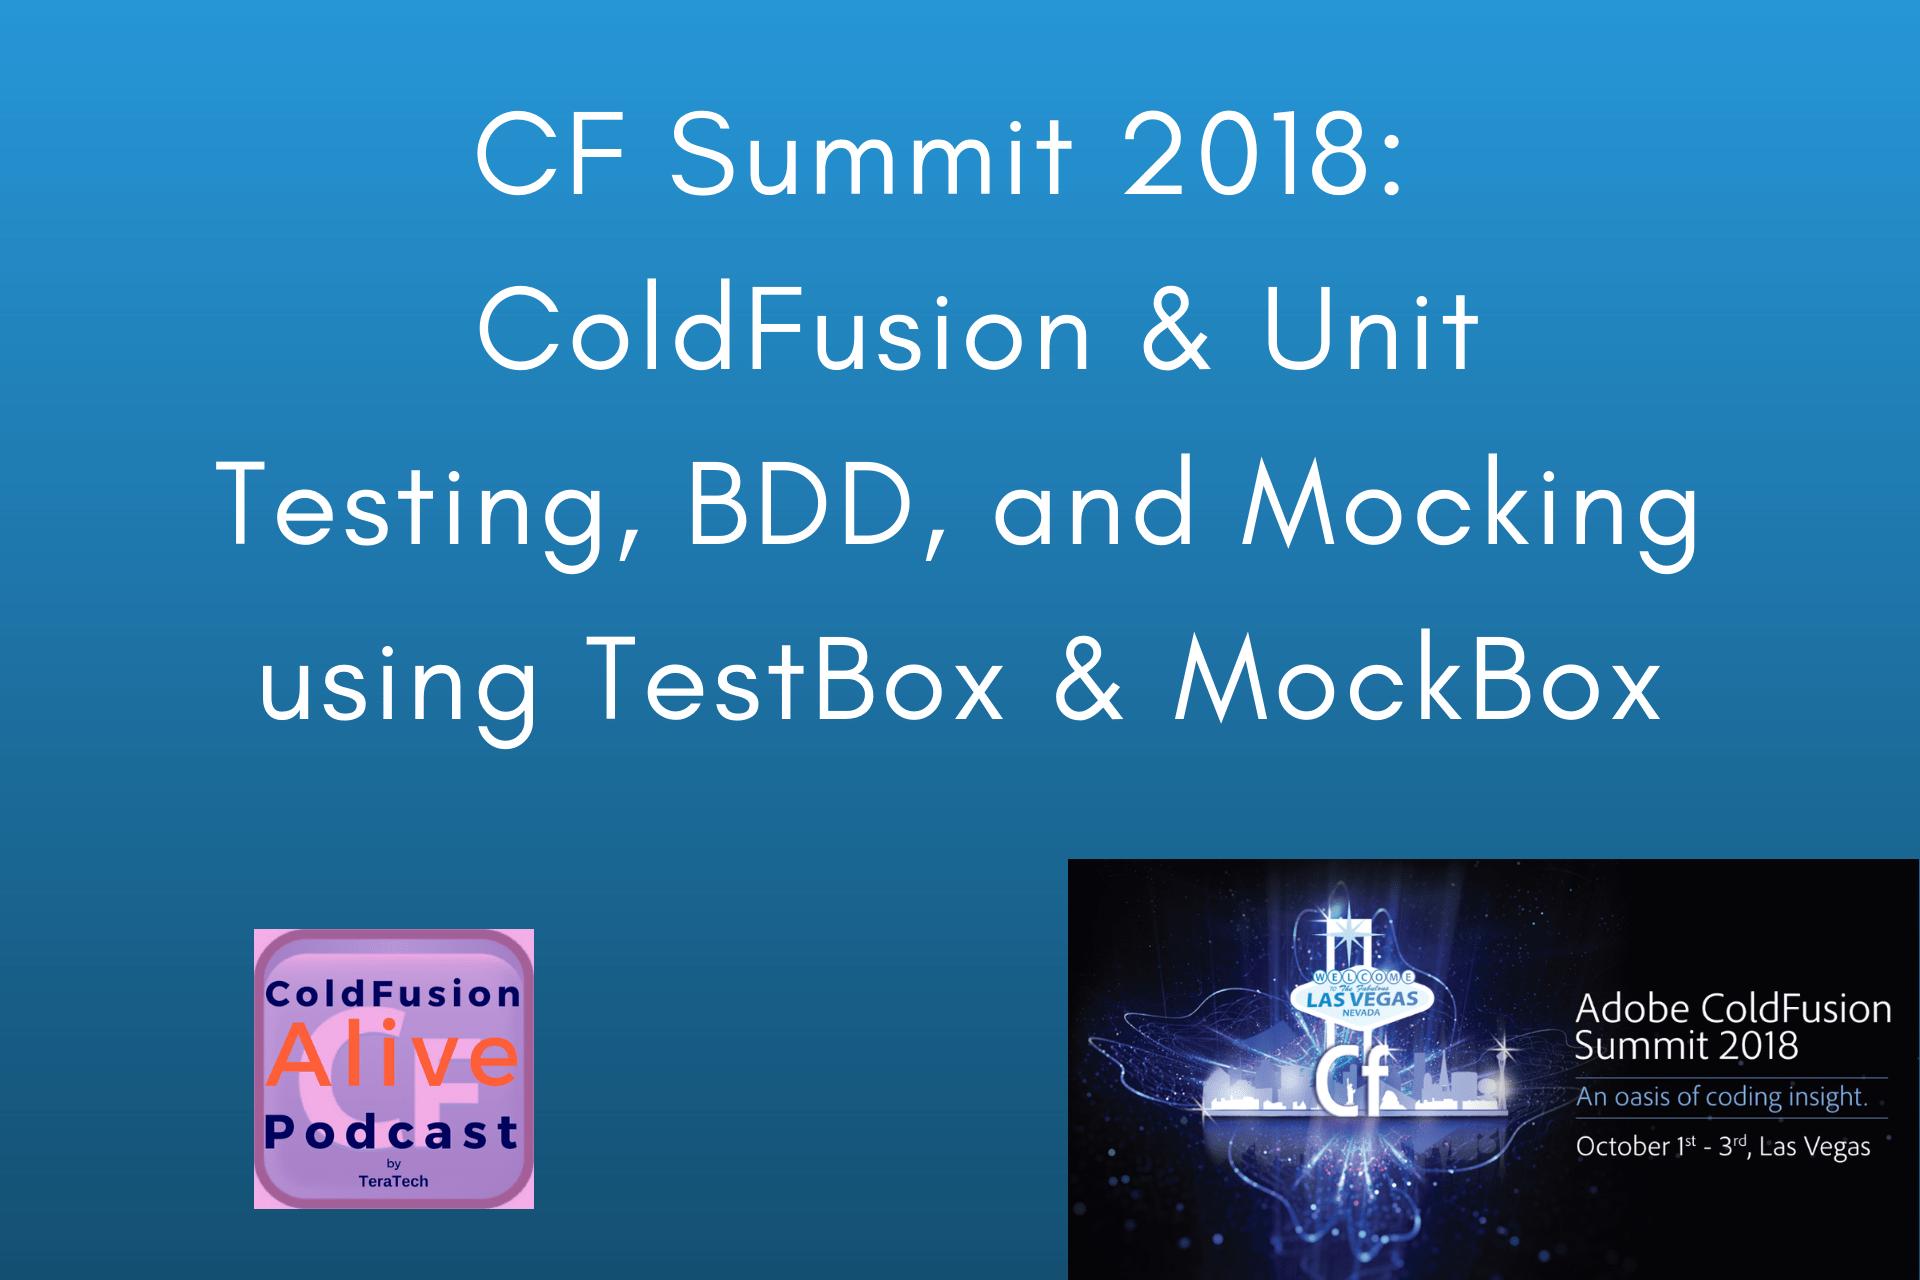 Everything CF Summit 2018: ColdFusion & Unit Testing, BDD, and Mocking using TestBox & MockBox